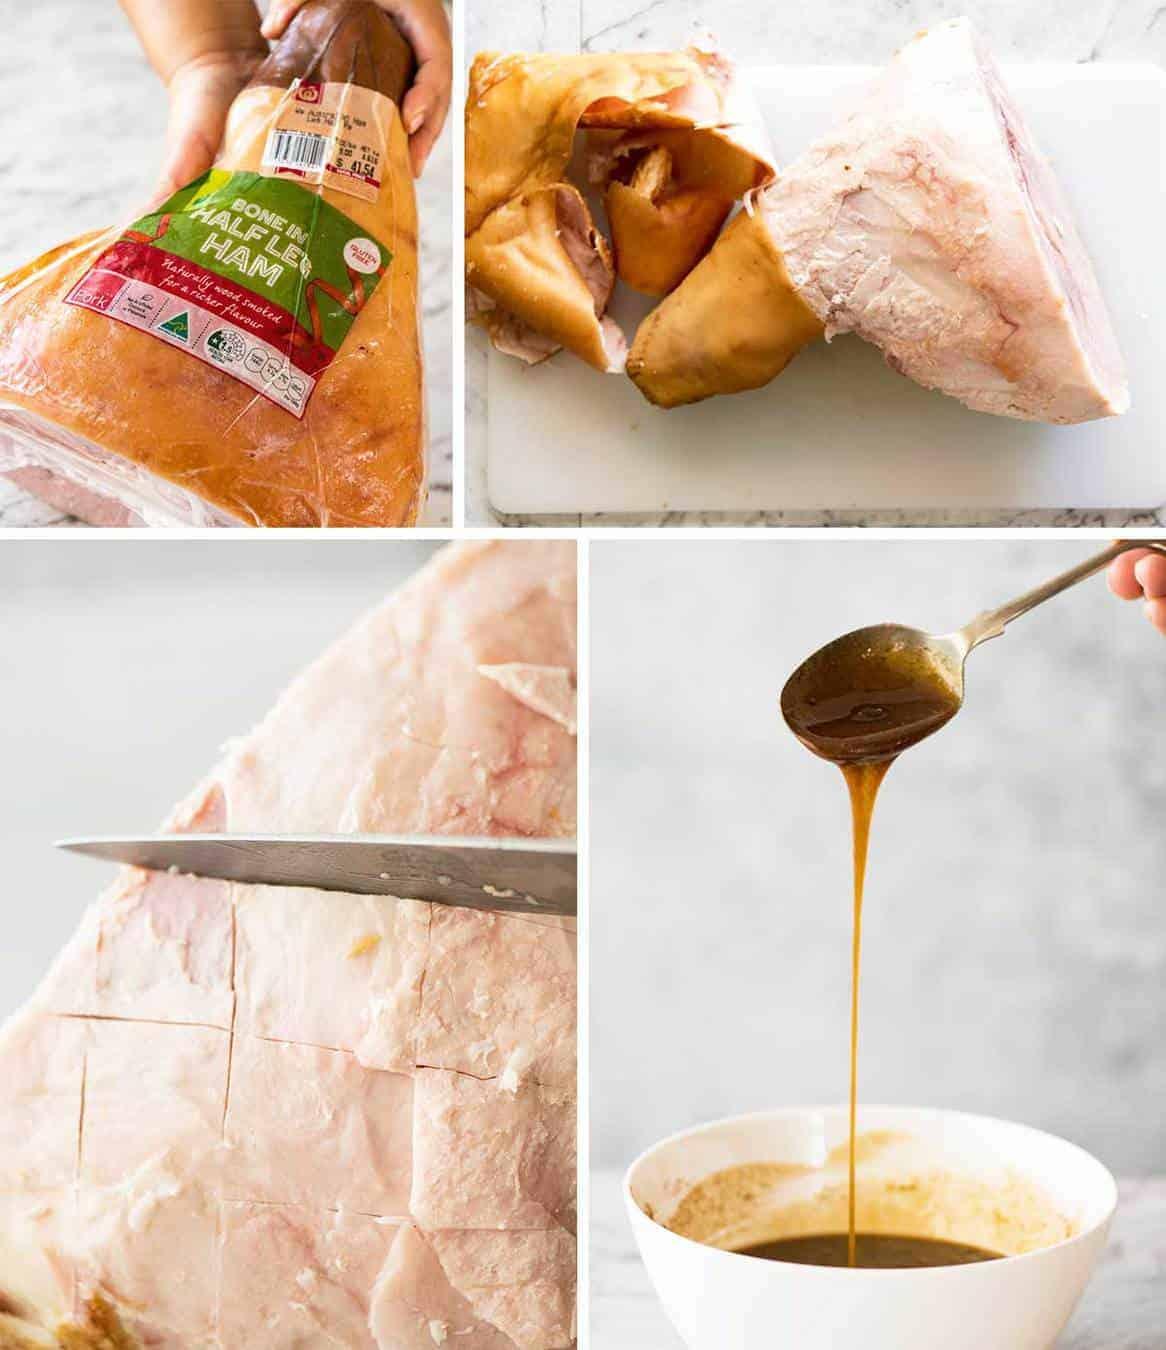 How to make a Glazed Baked Ham www.recipetineats.com